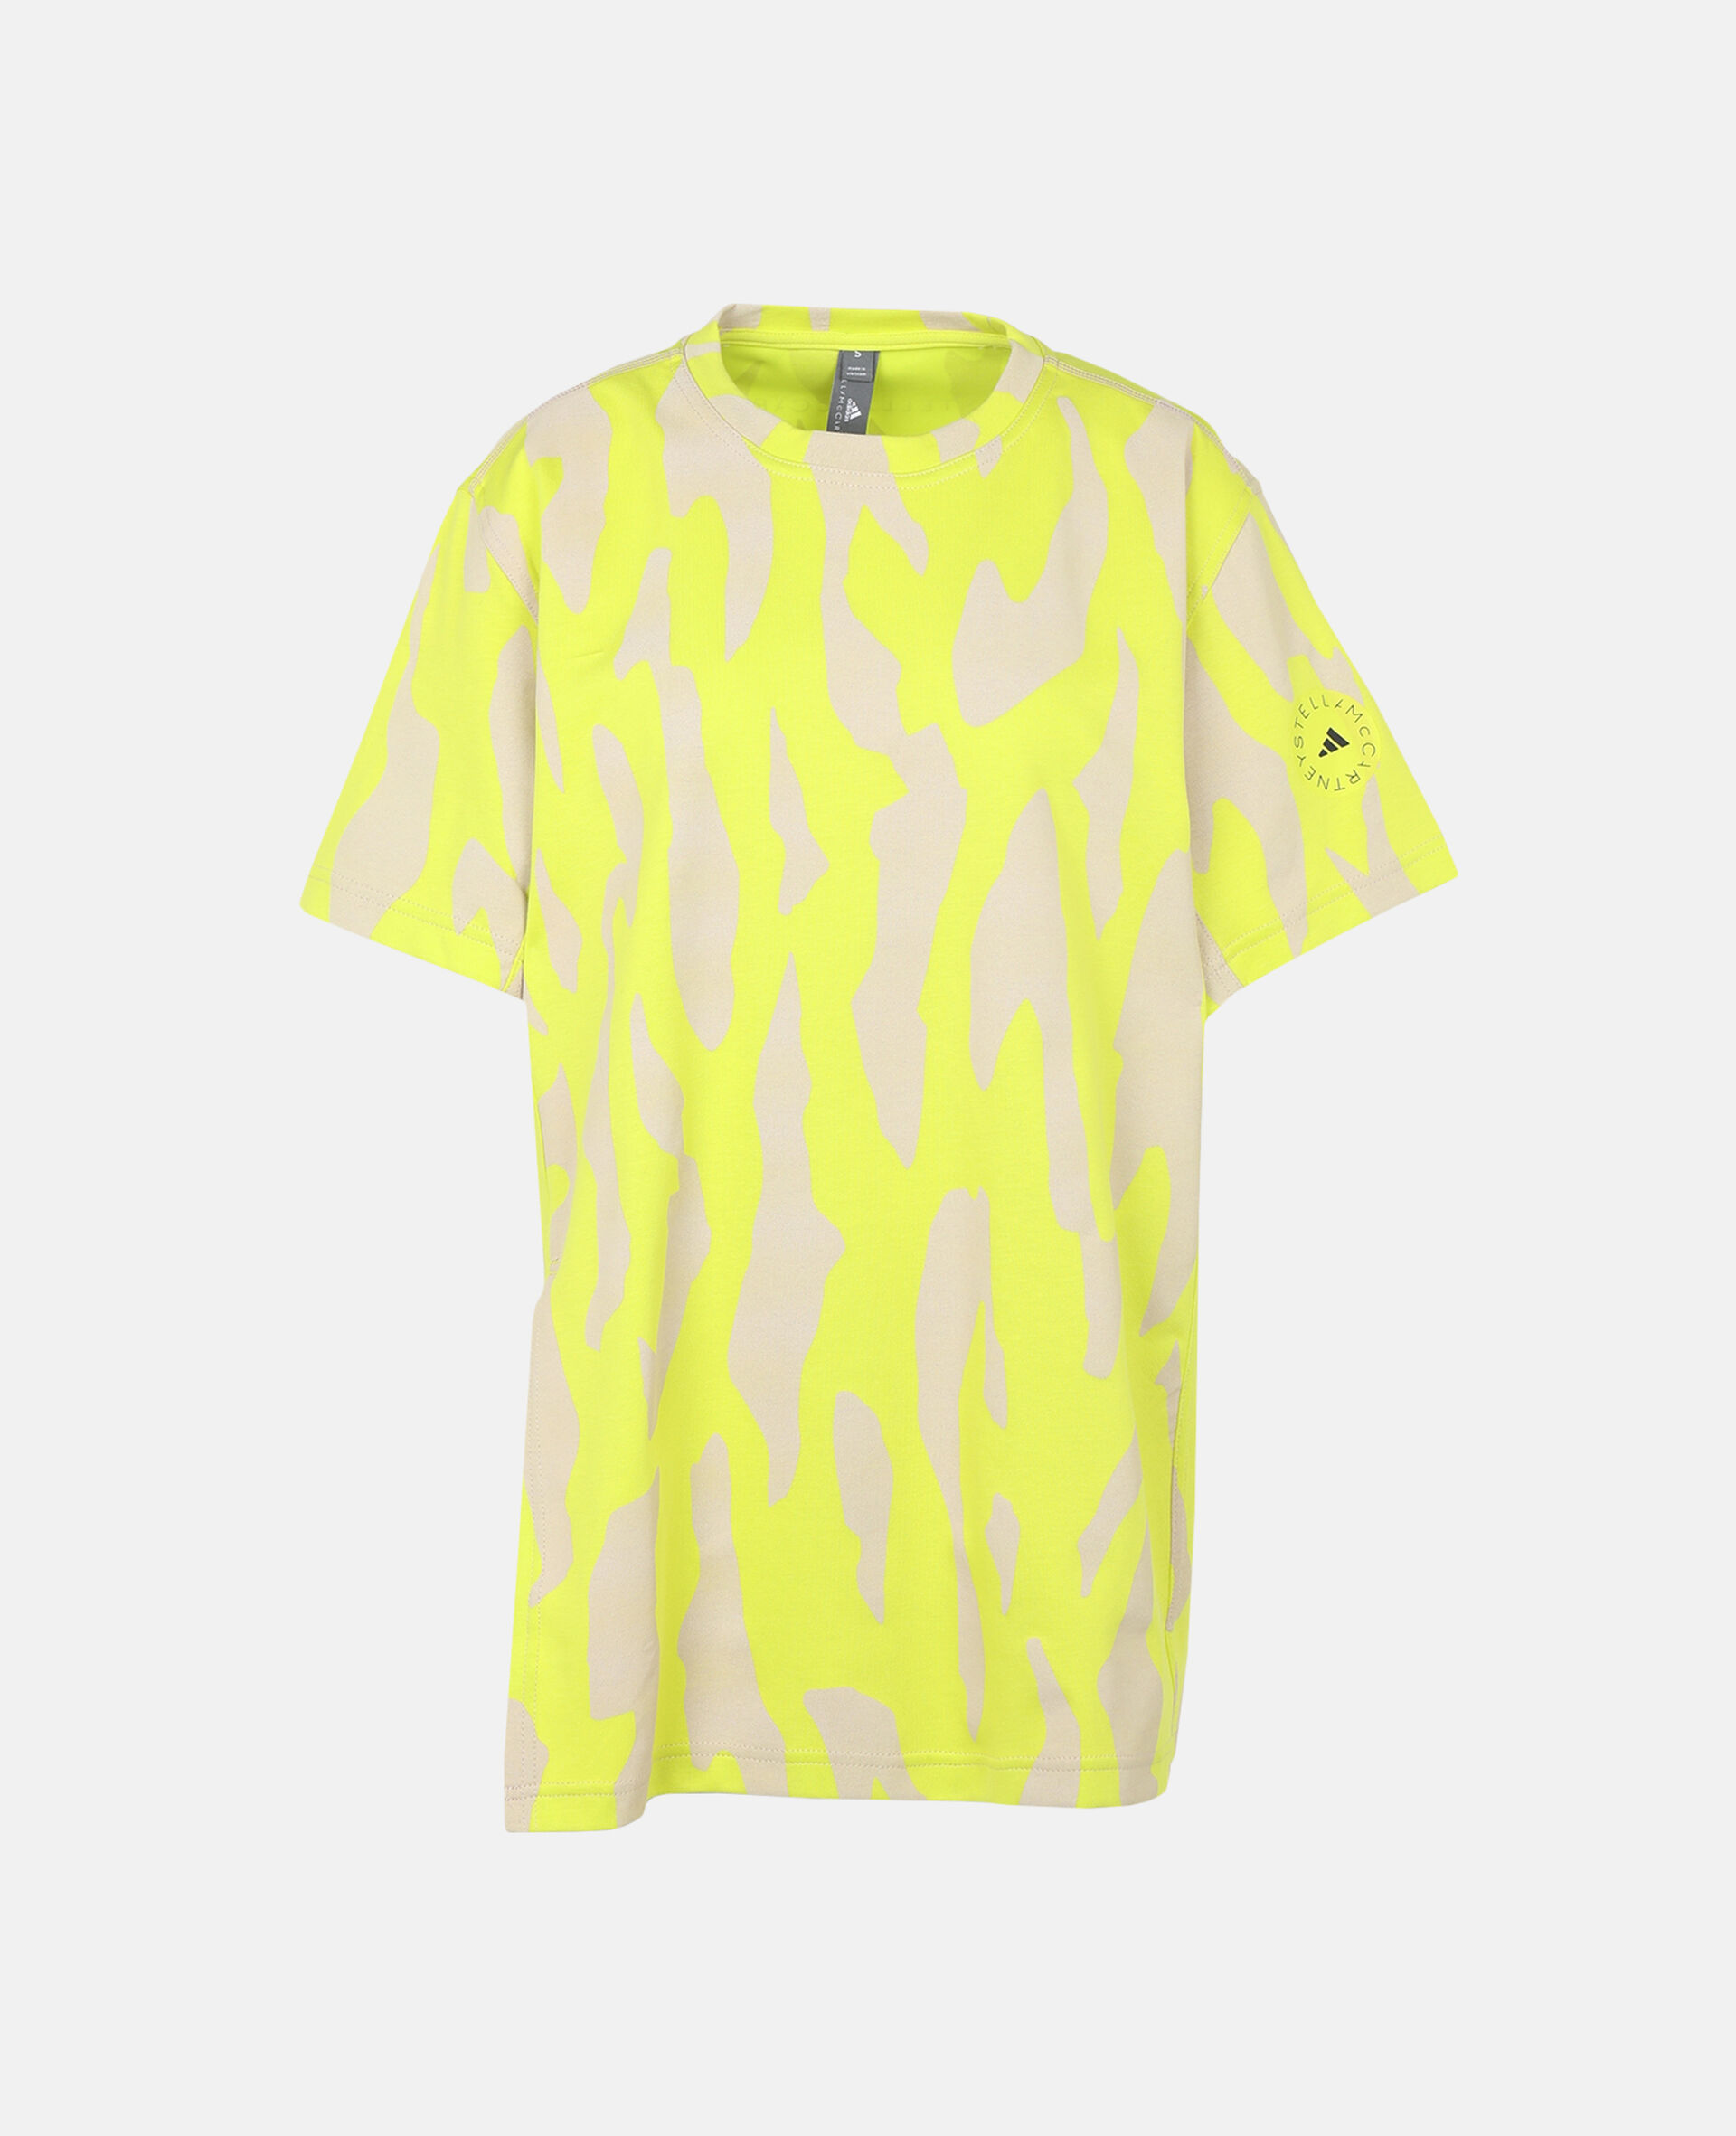 T-shirt Future Playground-Jaune-large image number 0